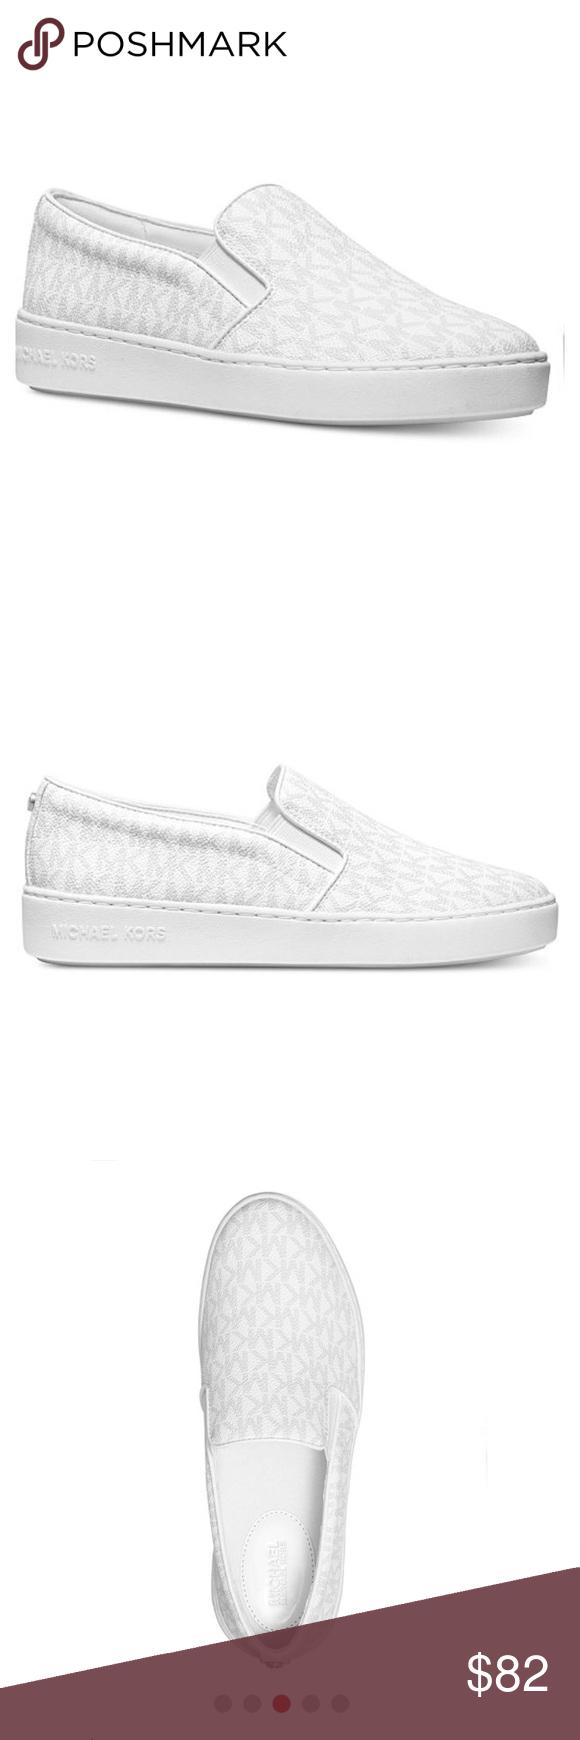 Michael Kors Keaton Slip-On Logo Sneakers in White Michael Kors Keaton Slip-On L…